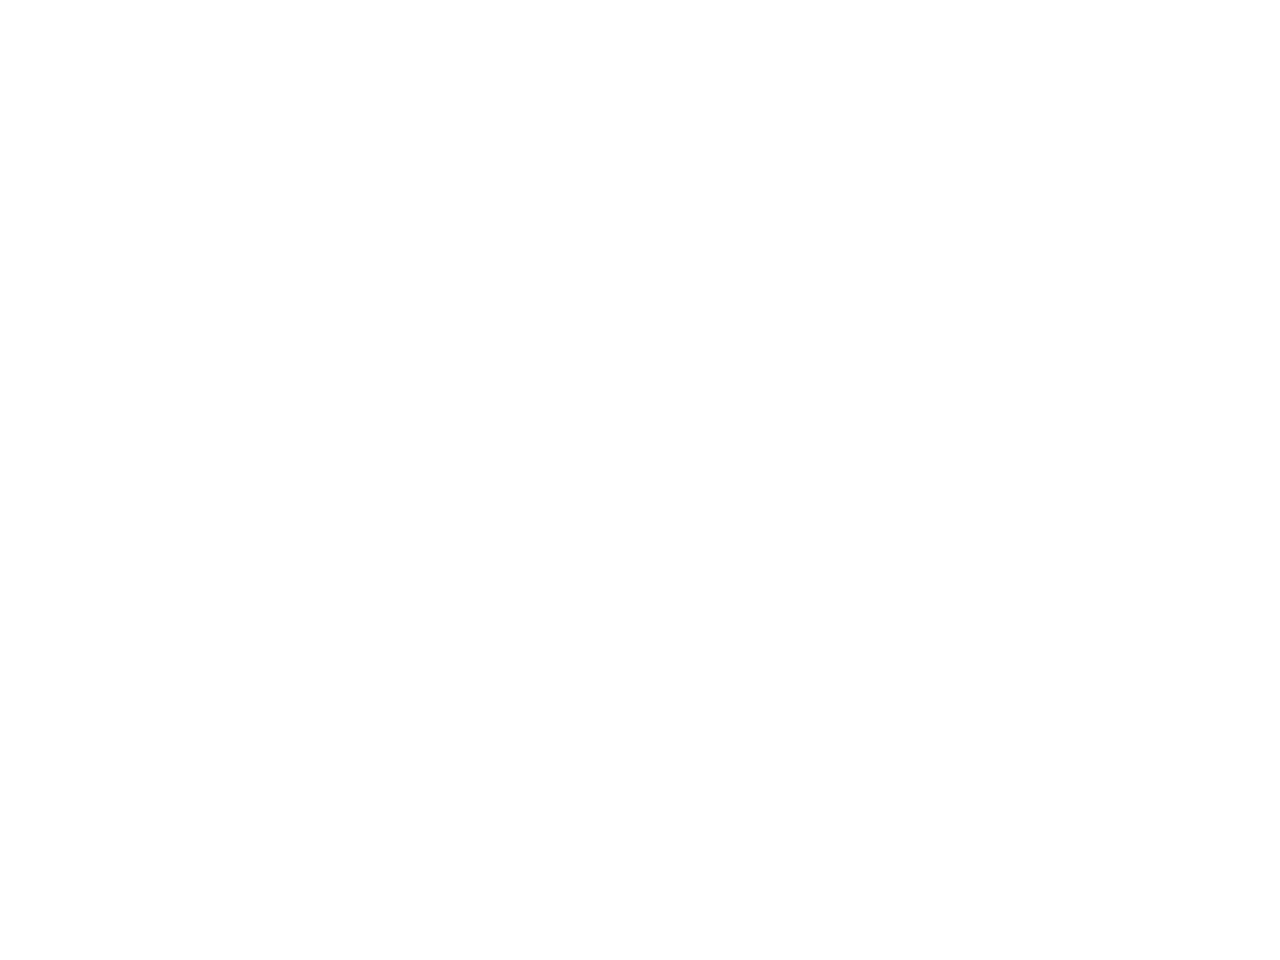 医療法人優心会  こいし歯科 (大阪府池田市)